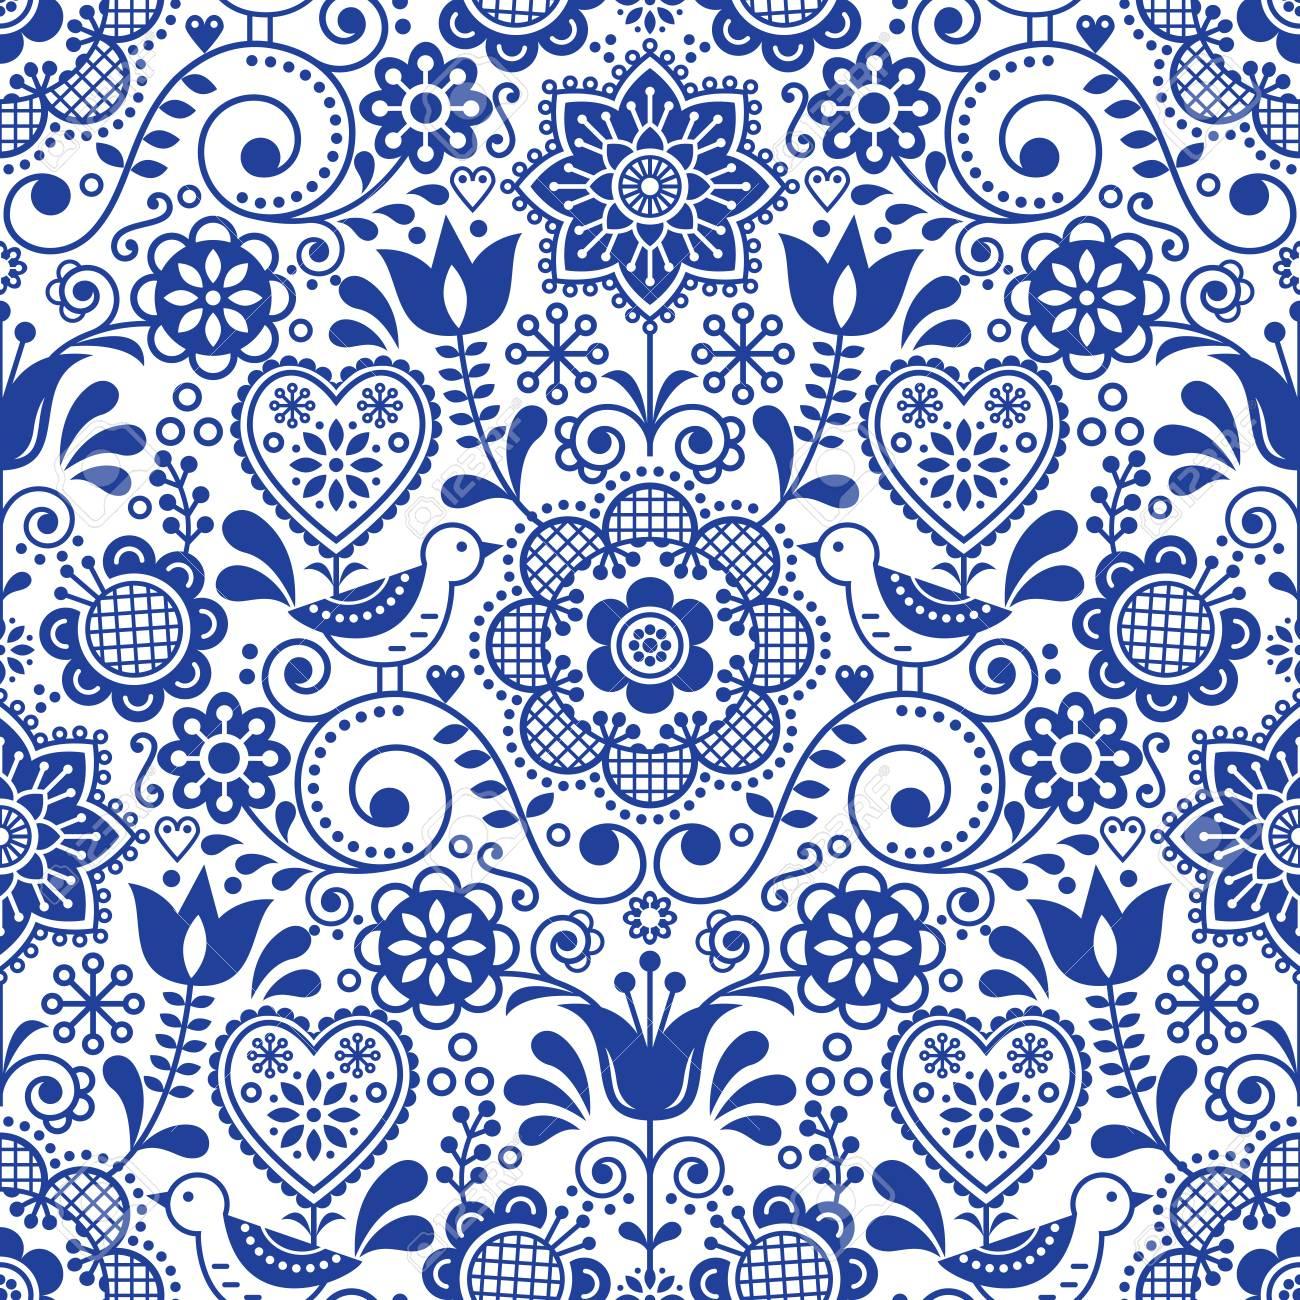 Seamless folk art pattern with birds and flowers, Scandinavian navy blue repetitive floral design - 96137192